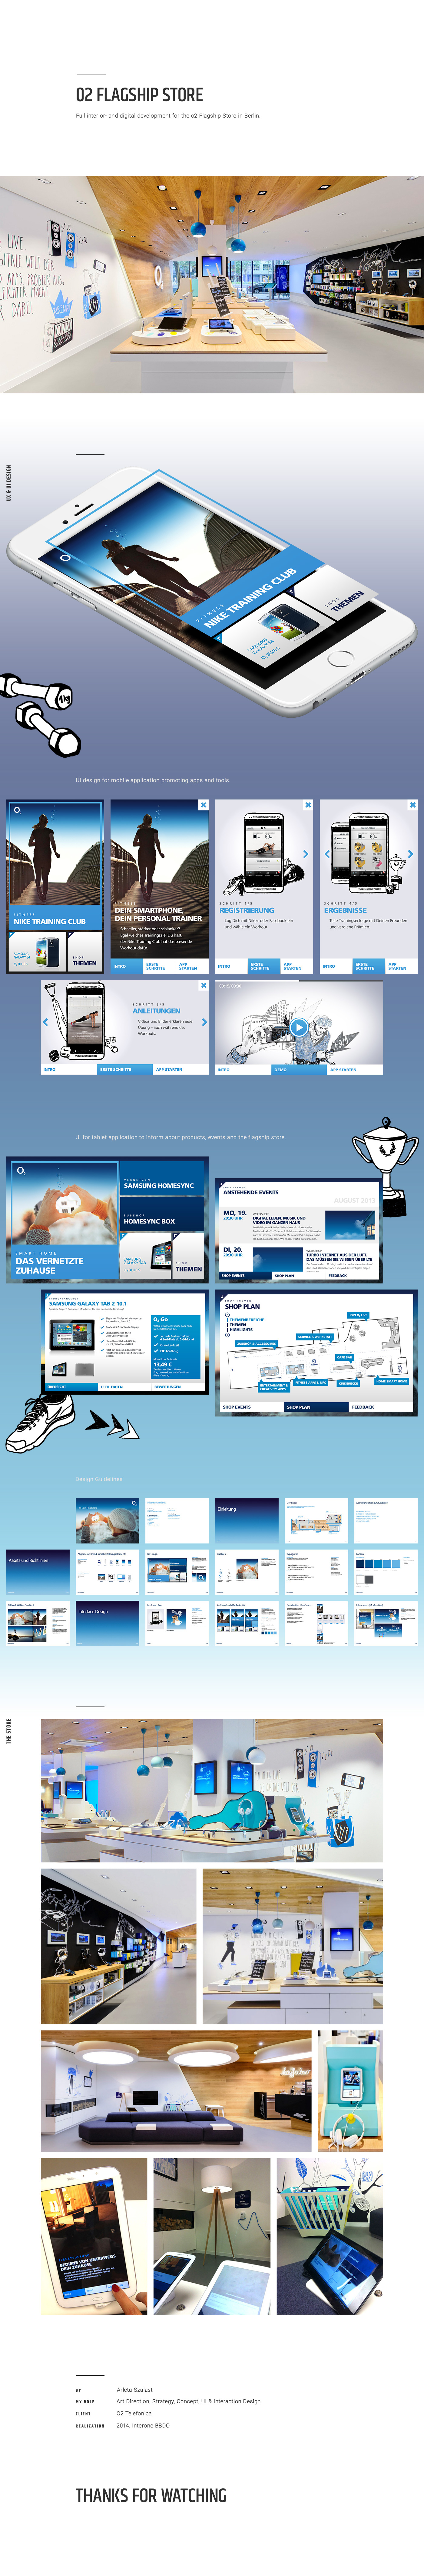 UX design Interaction design  ui design interior design  Flagship Store app shop Interior mobile tablet